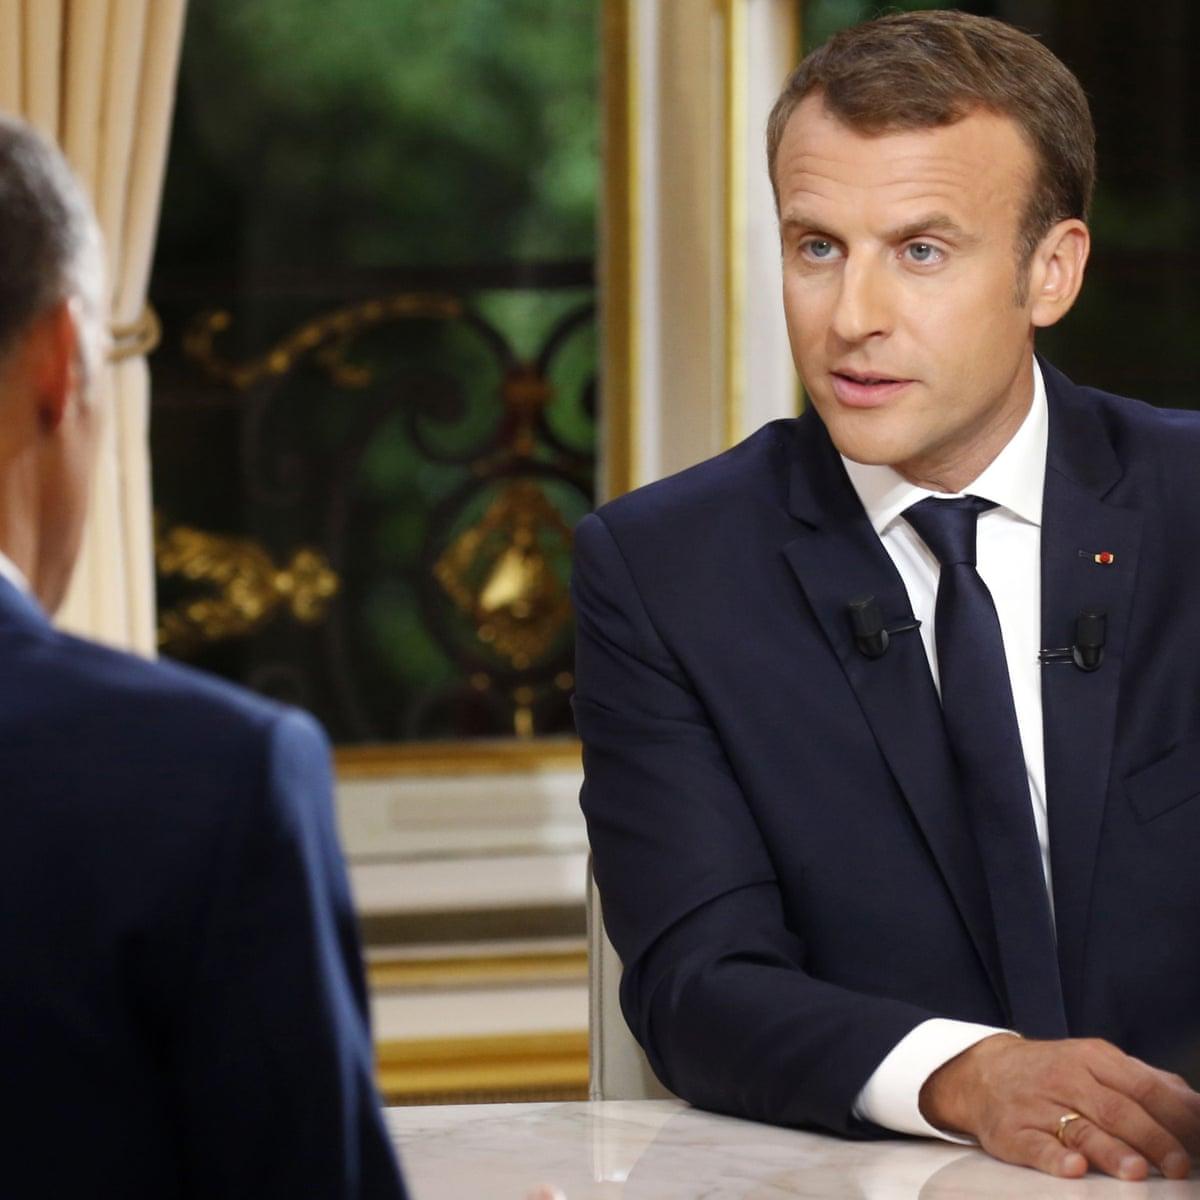 Emmanuel Macron Claims In Tv Interview I Am Not Cut Off Emmanuel Macron The Guardian